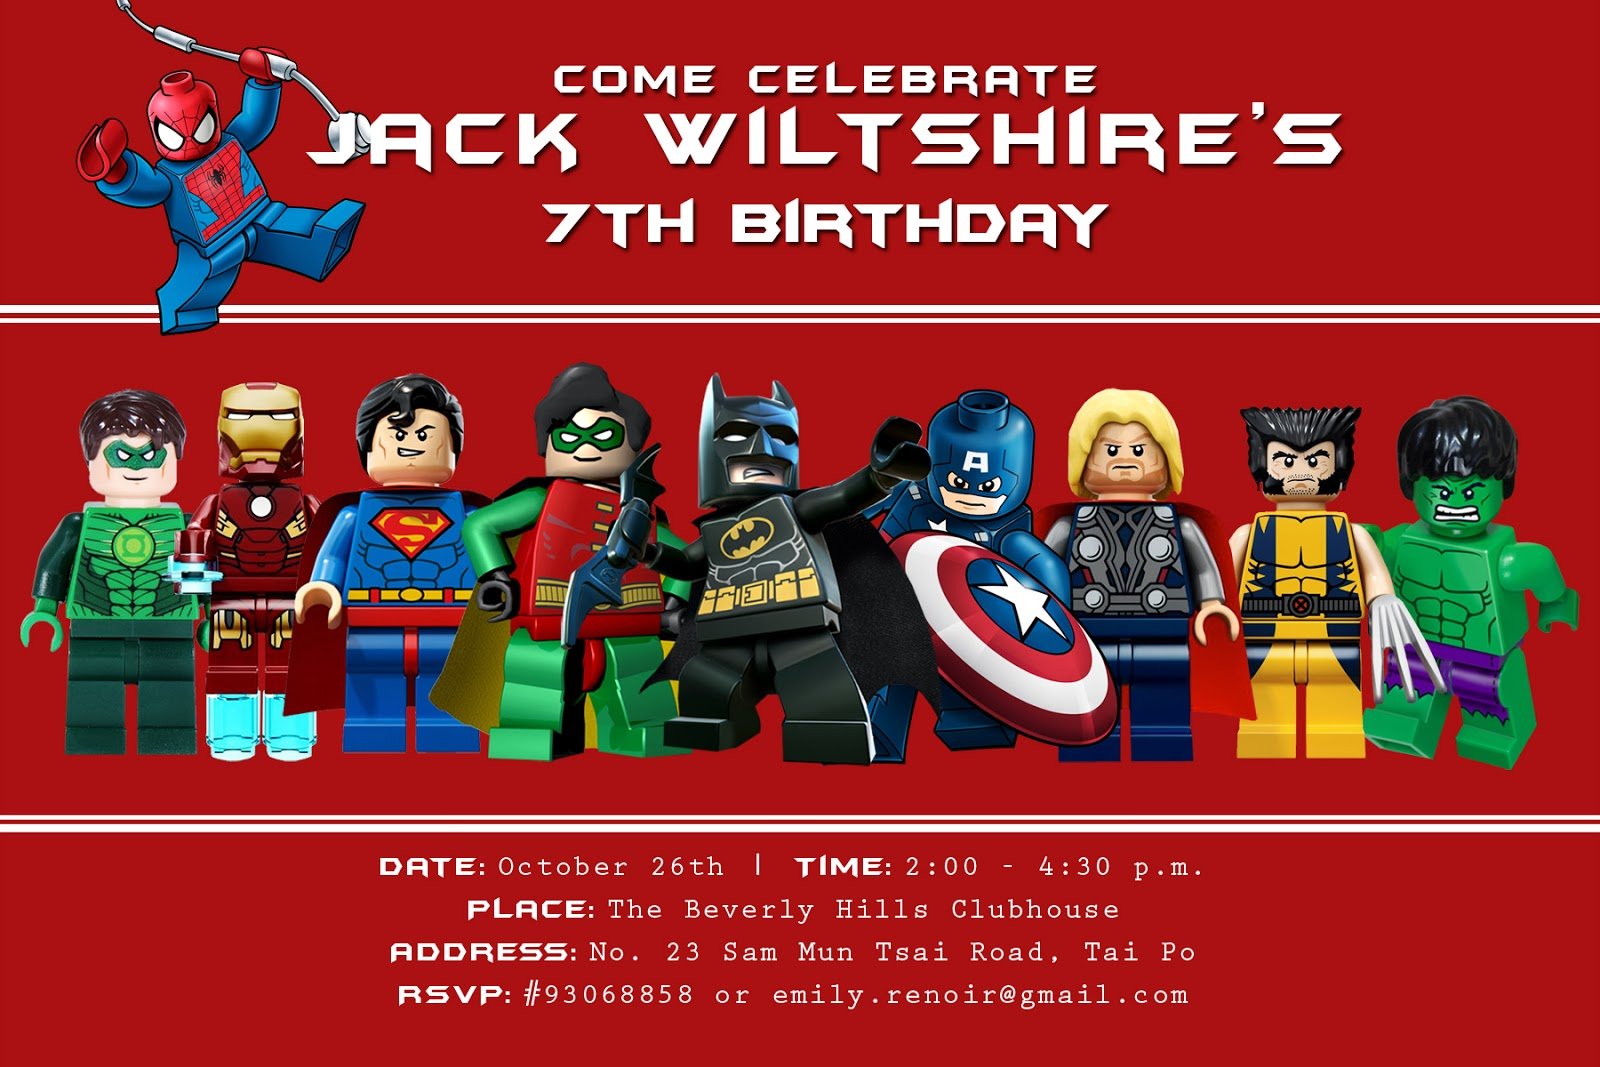 Jacks 7th Birthday Lego SUPERheros